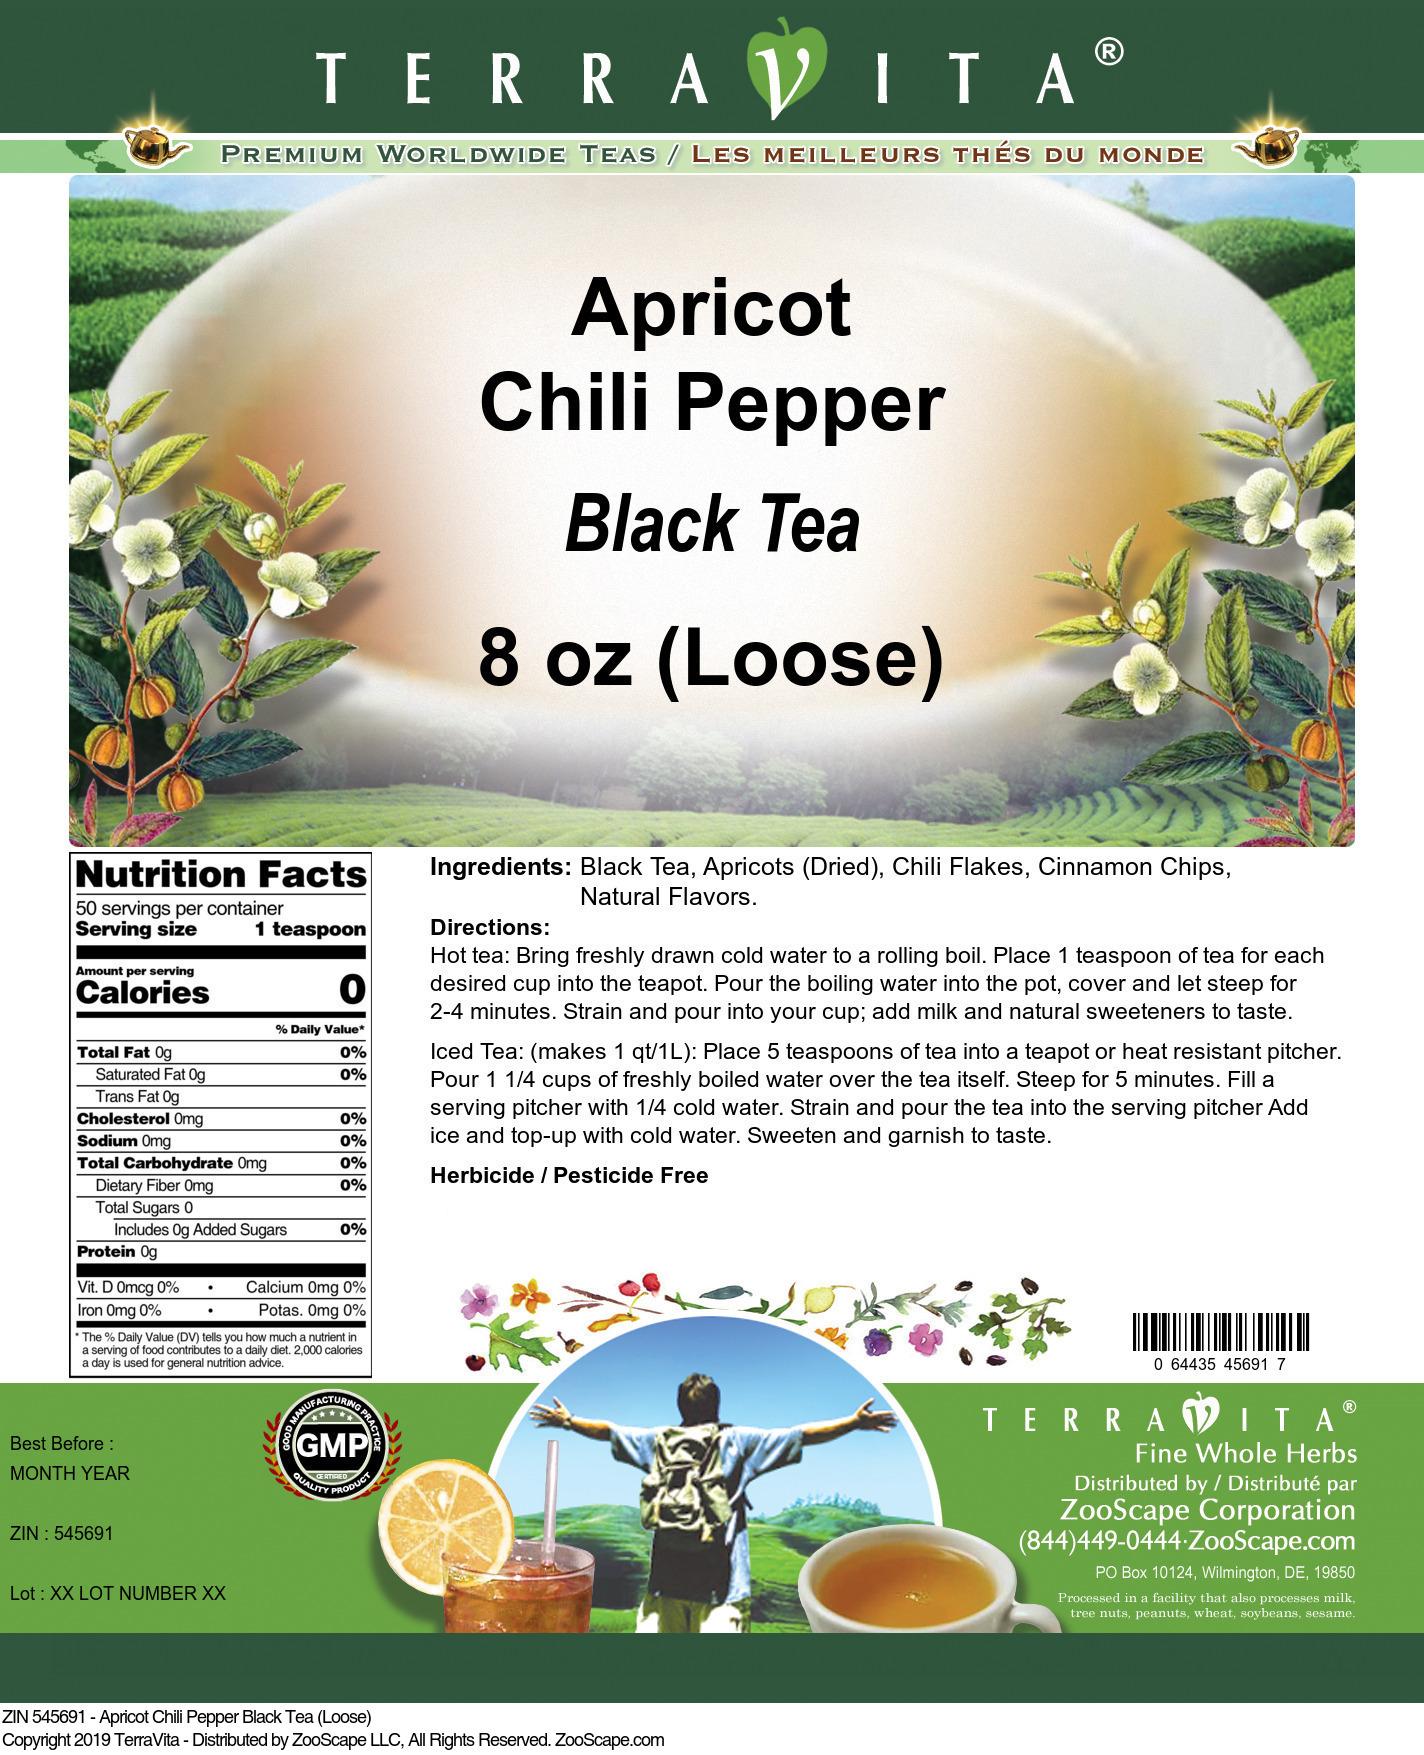 Apricot Chili Pepper Black Tea (Loose)